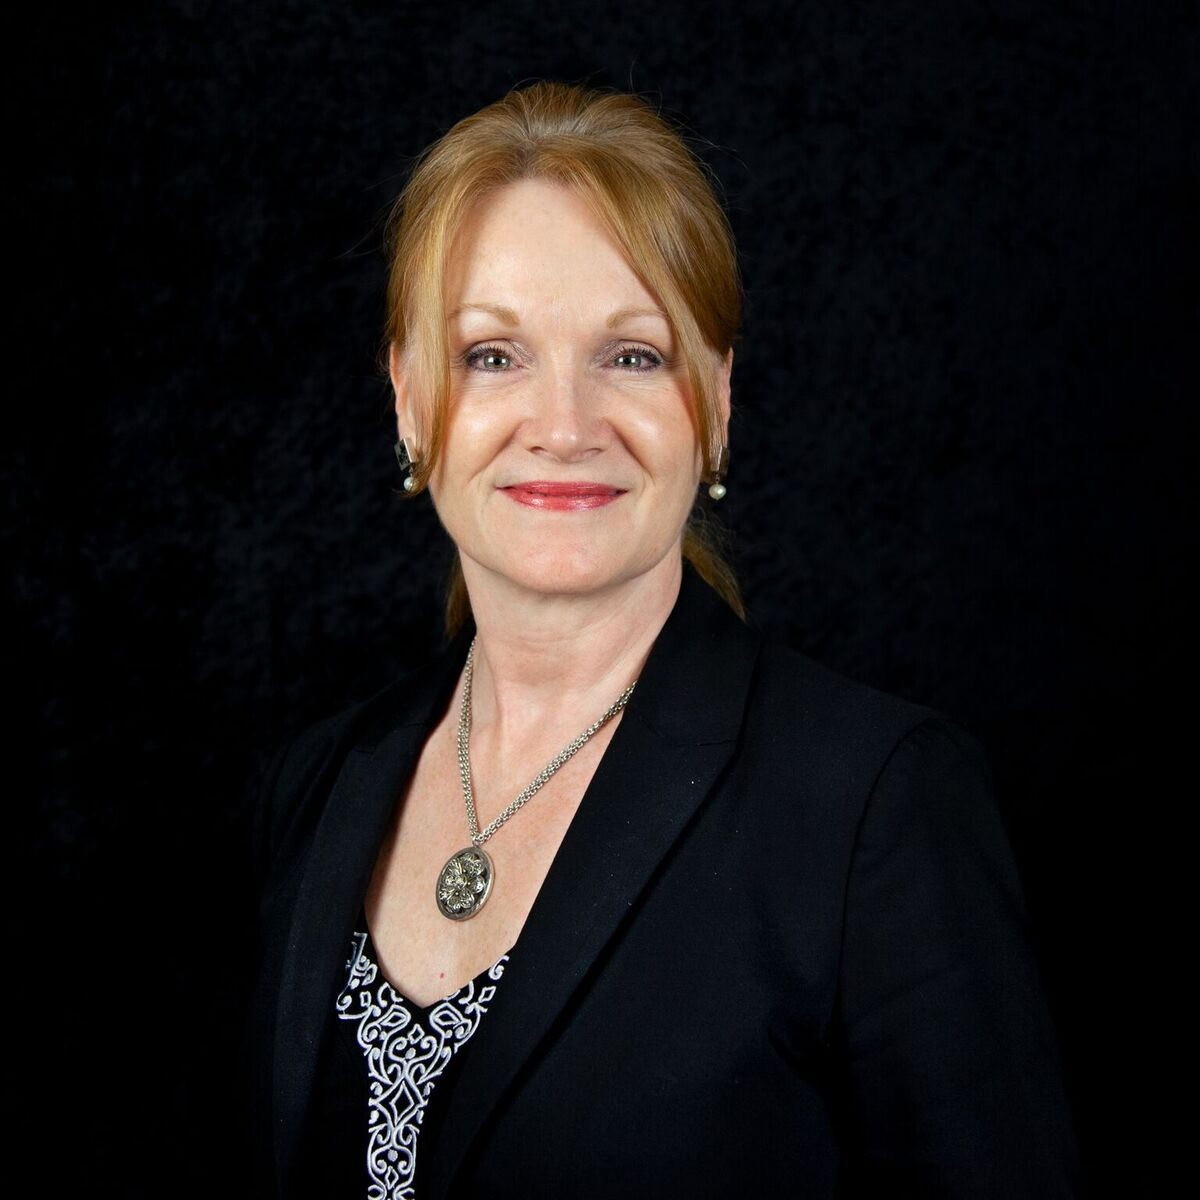 Kim Stuntz, Director of Finance